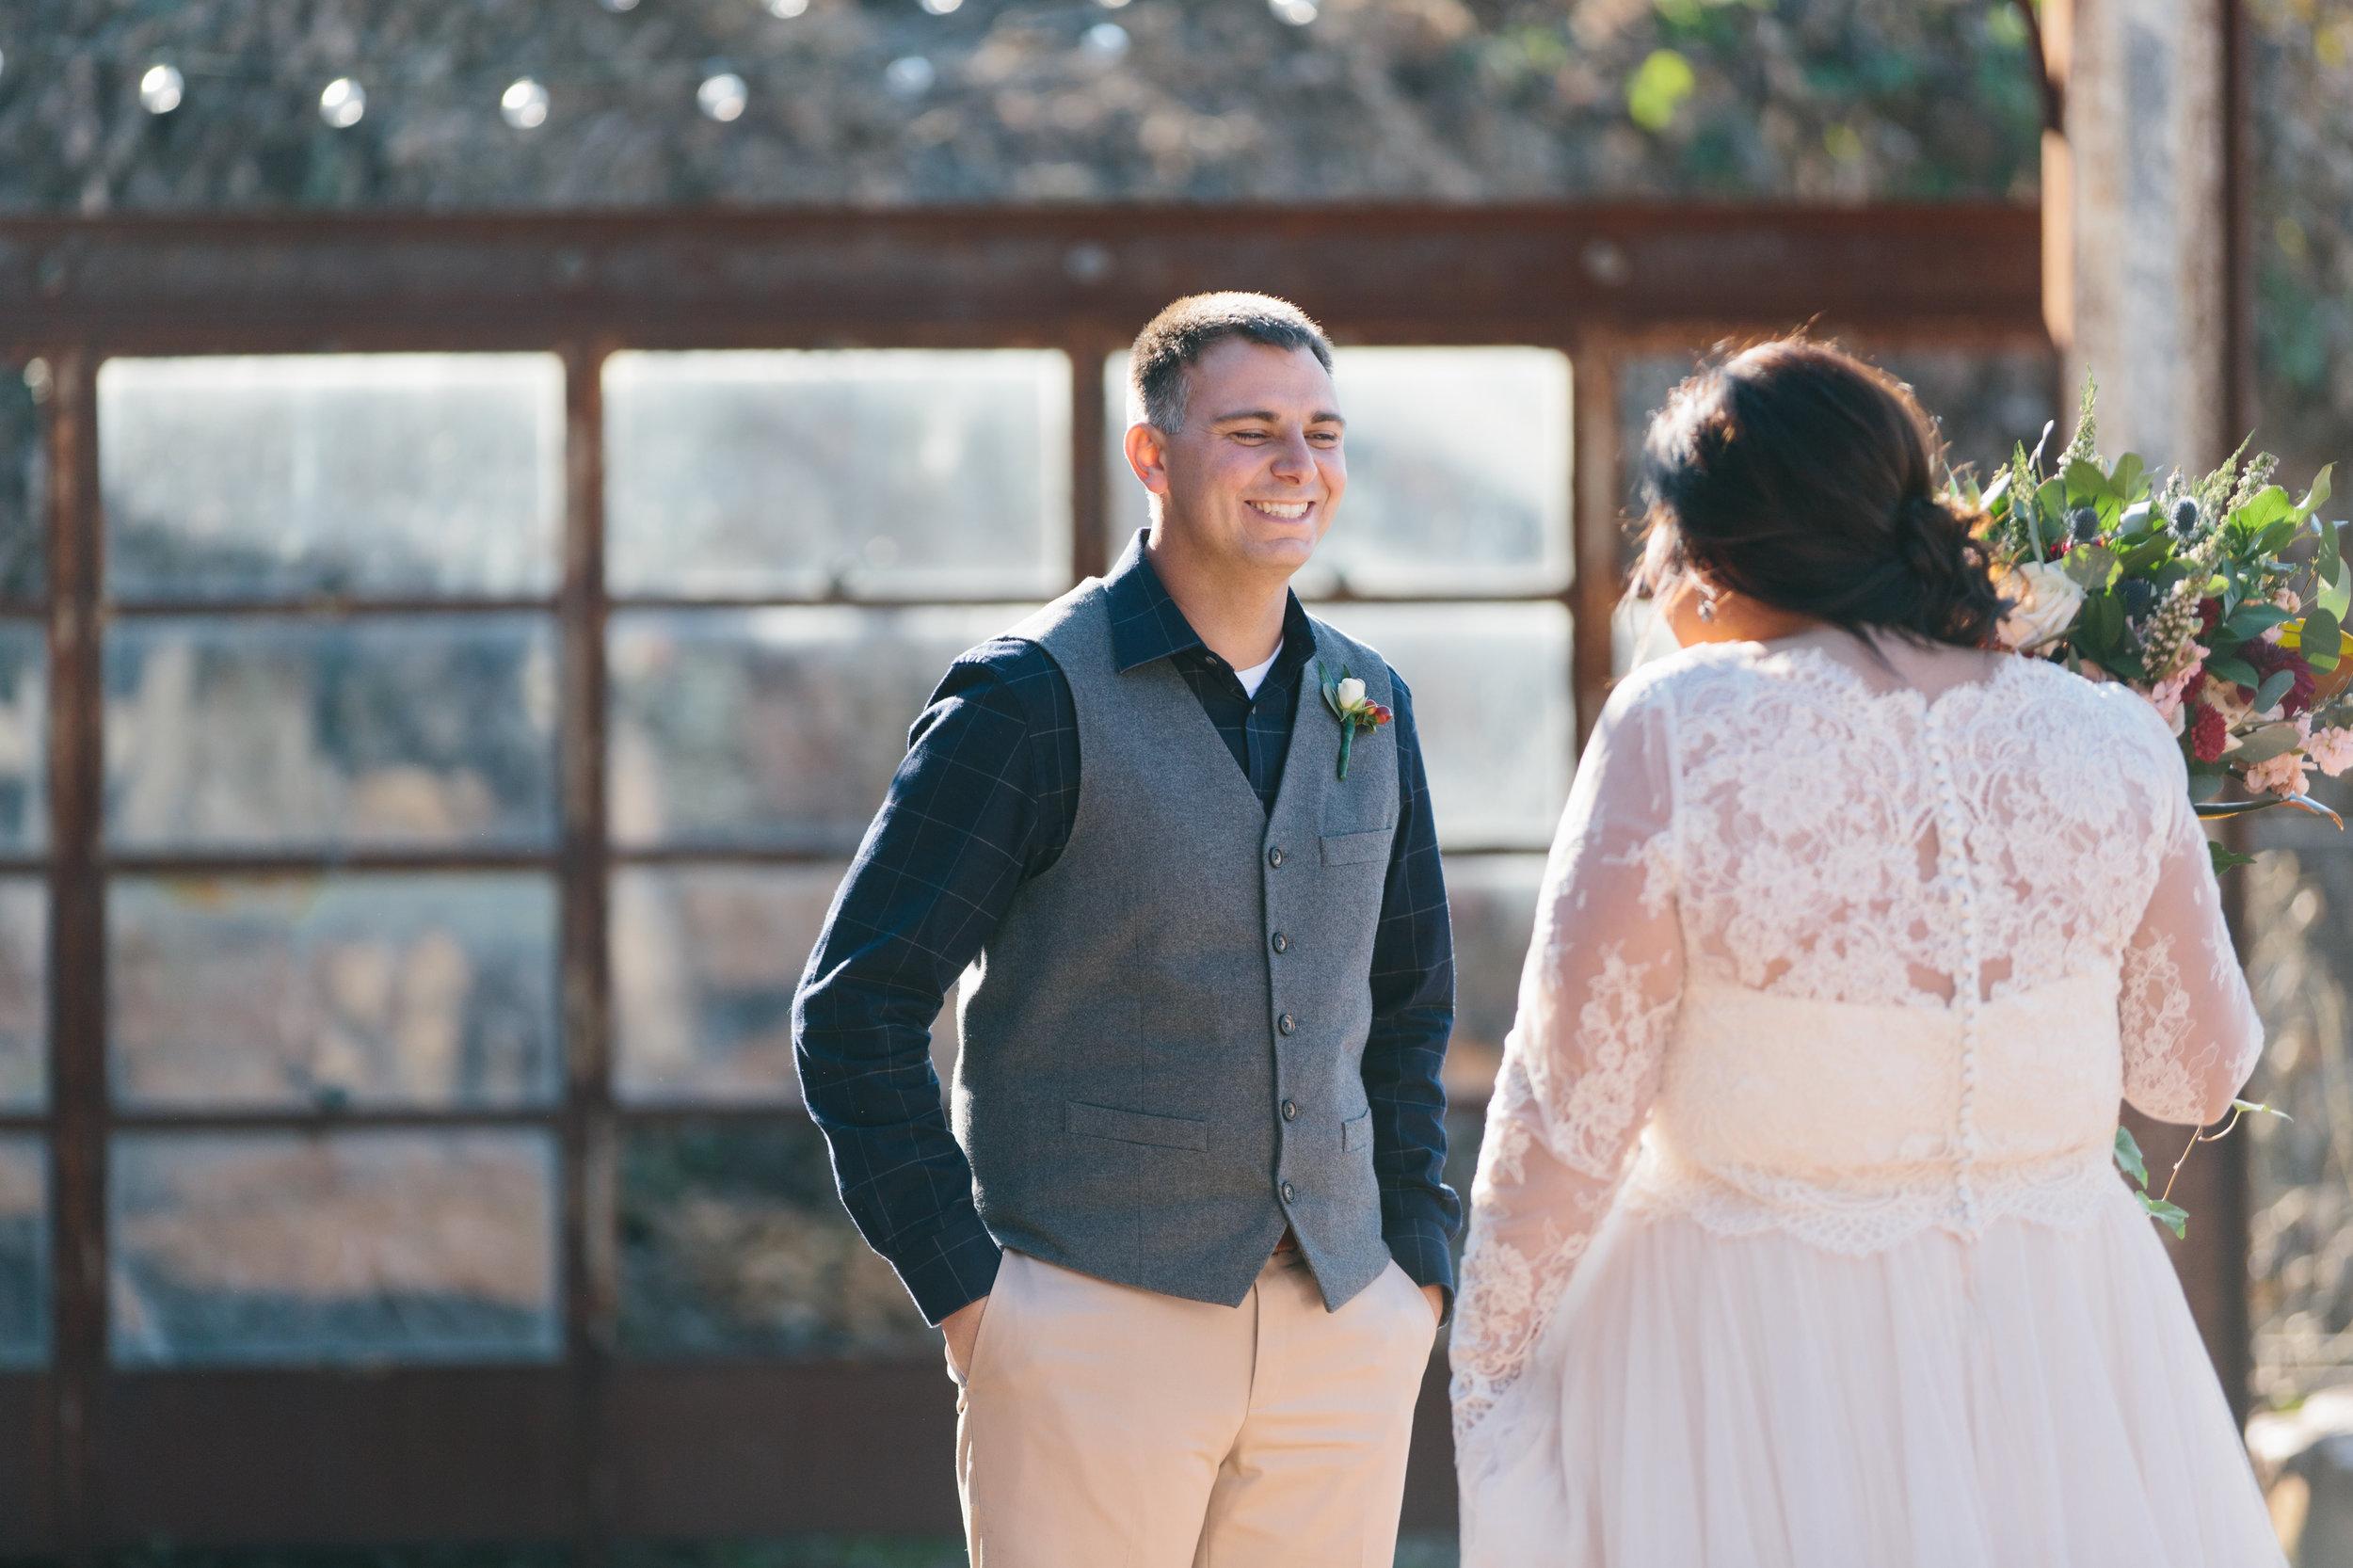 Lauren_Jeremy_Standard_Wedding_Knoxville_Abigail_Malone_Photography_FIlm-170.jpg